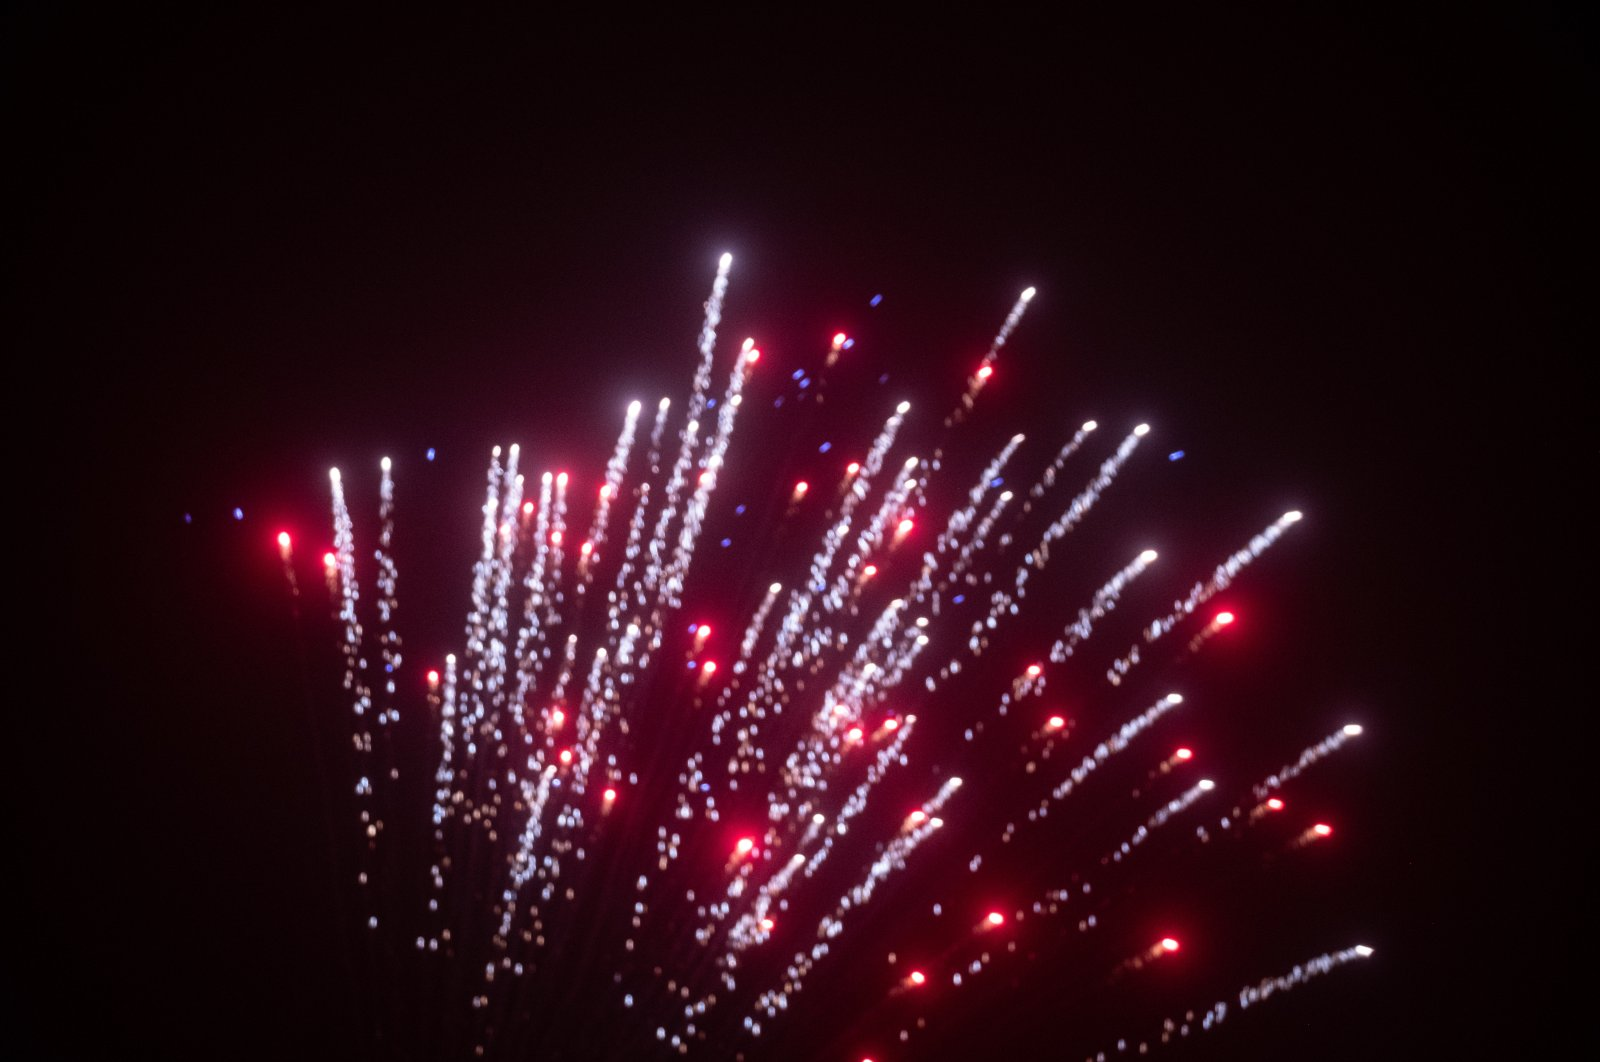 Fireworks illuminate the night sky in Aachen, Germany, Jan. 1, 2021. (Reuters Photo)